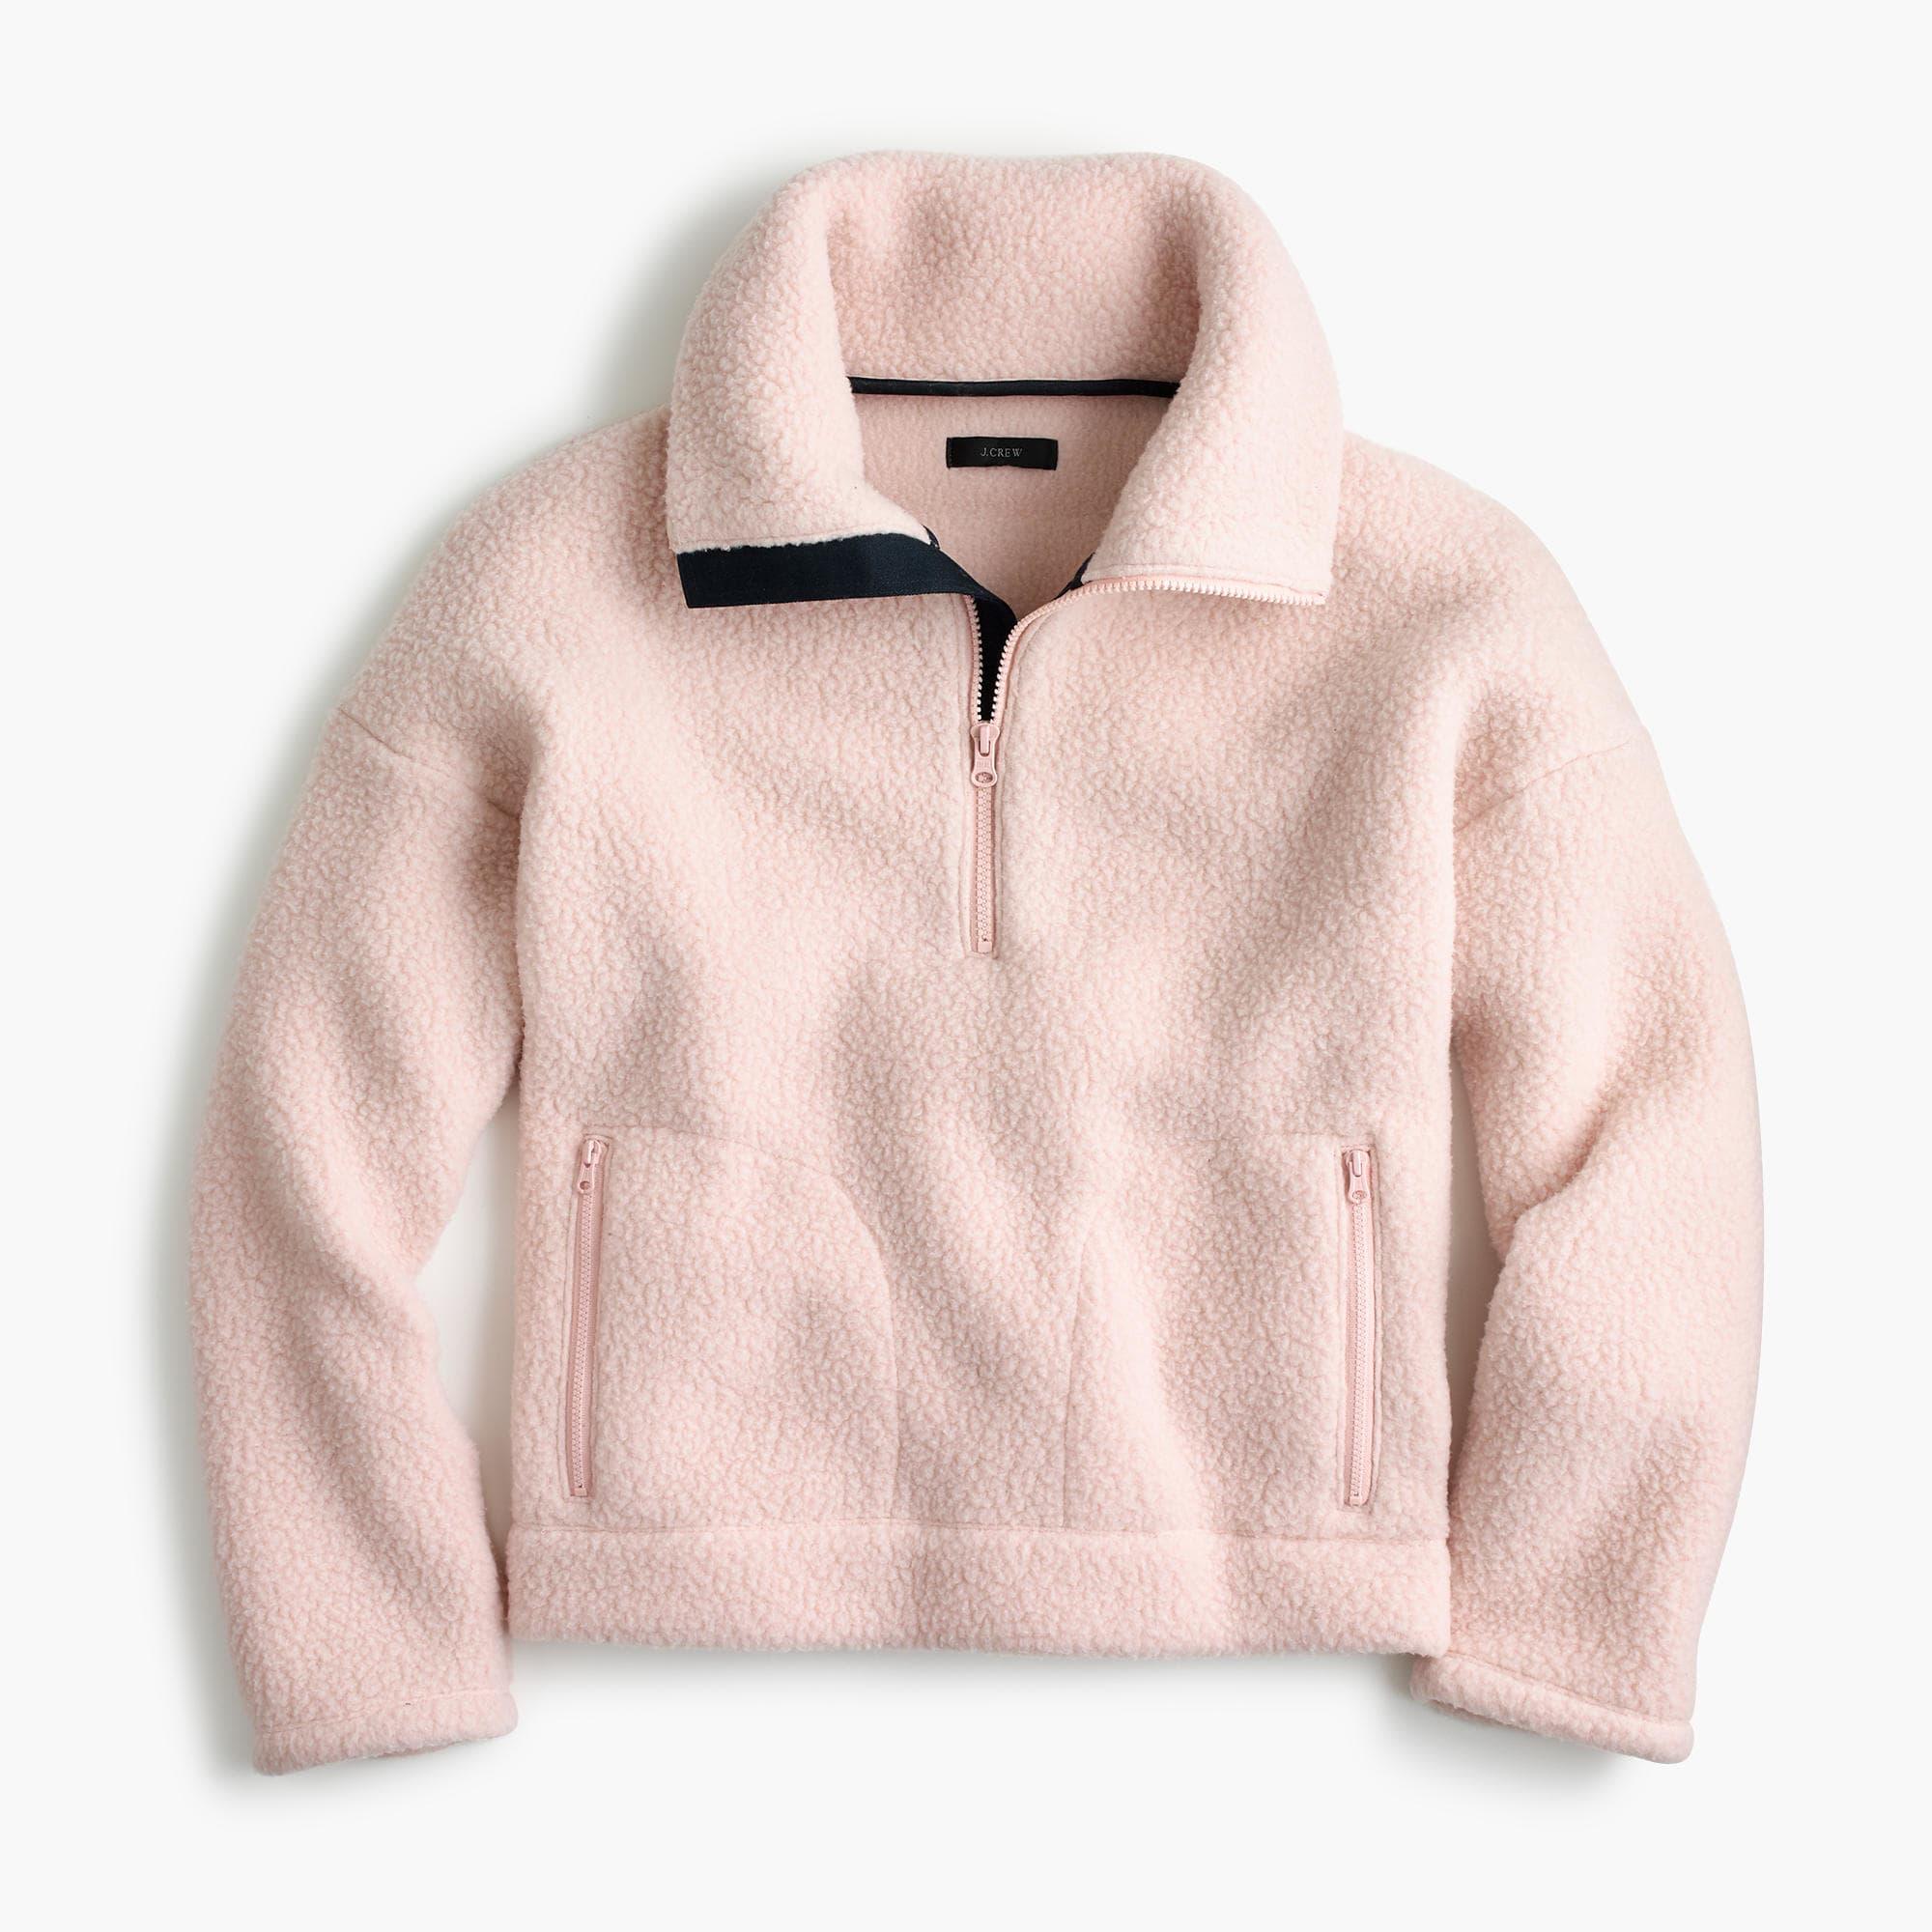 J.Crew fleece sweater